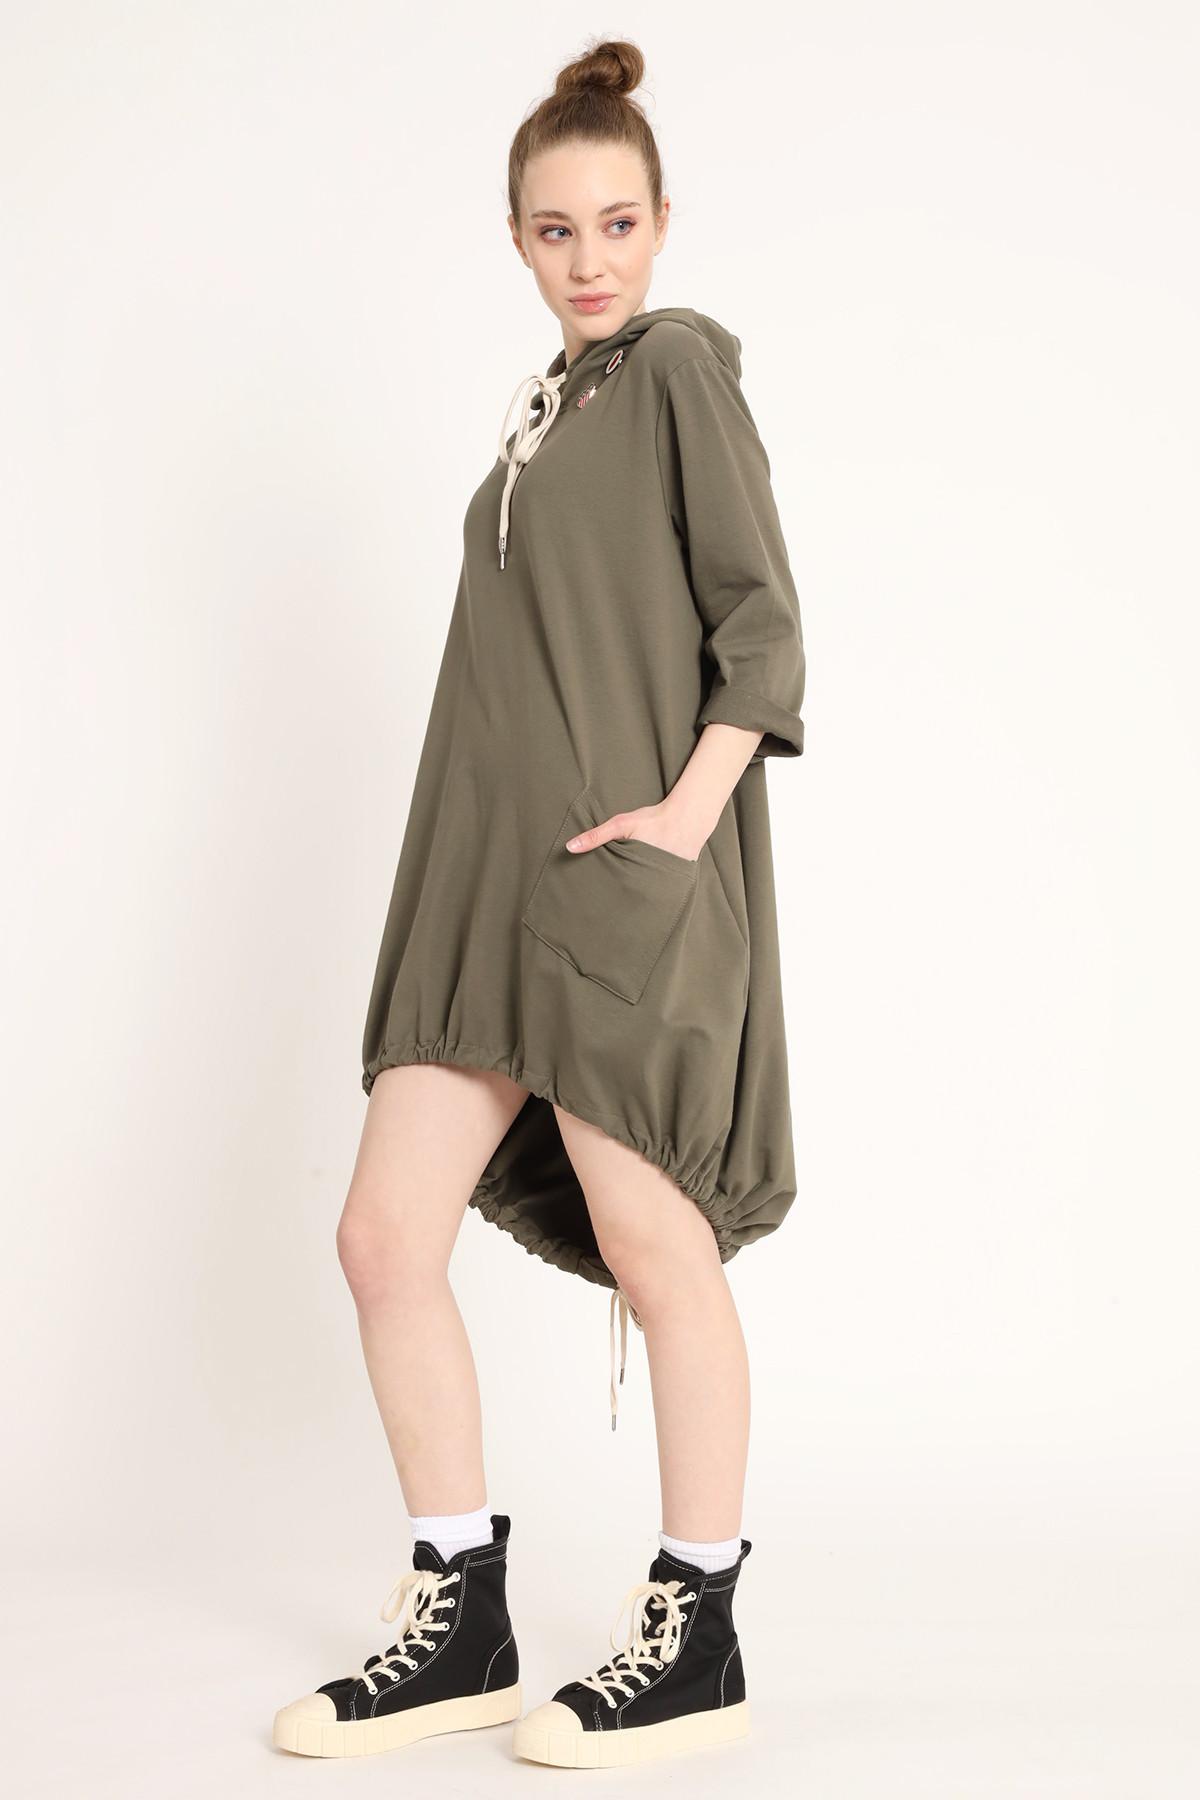 Sweatshirt Dress With Hood and Tail